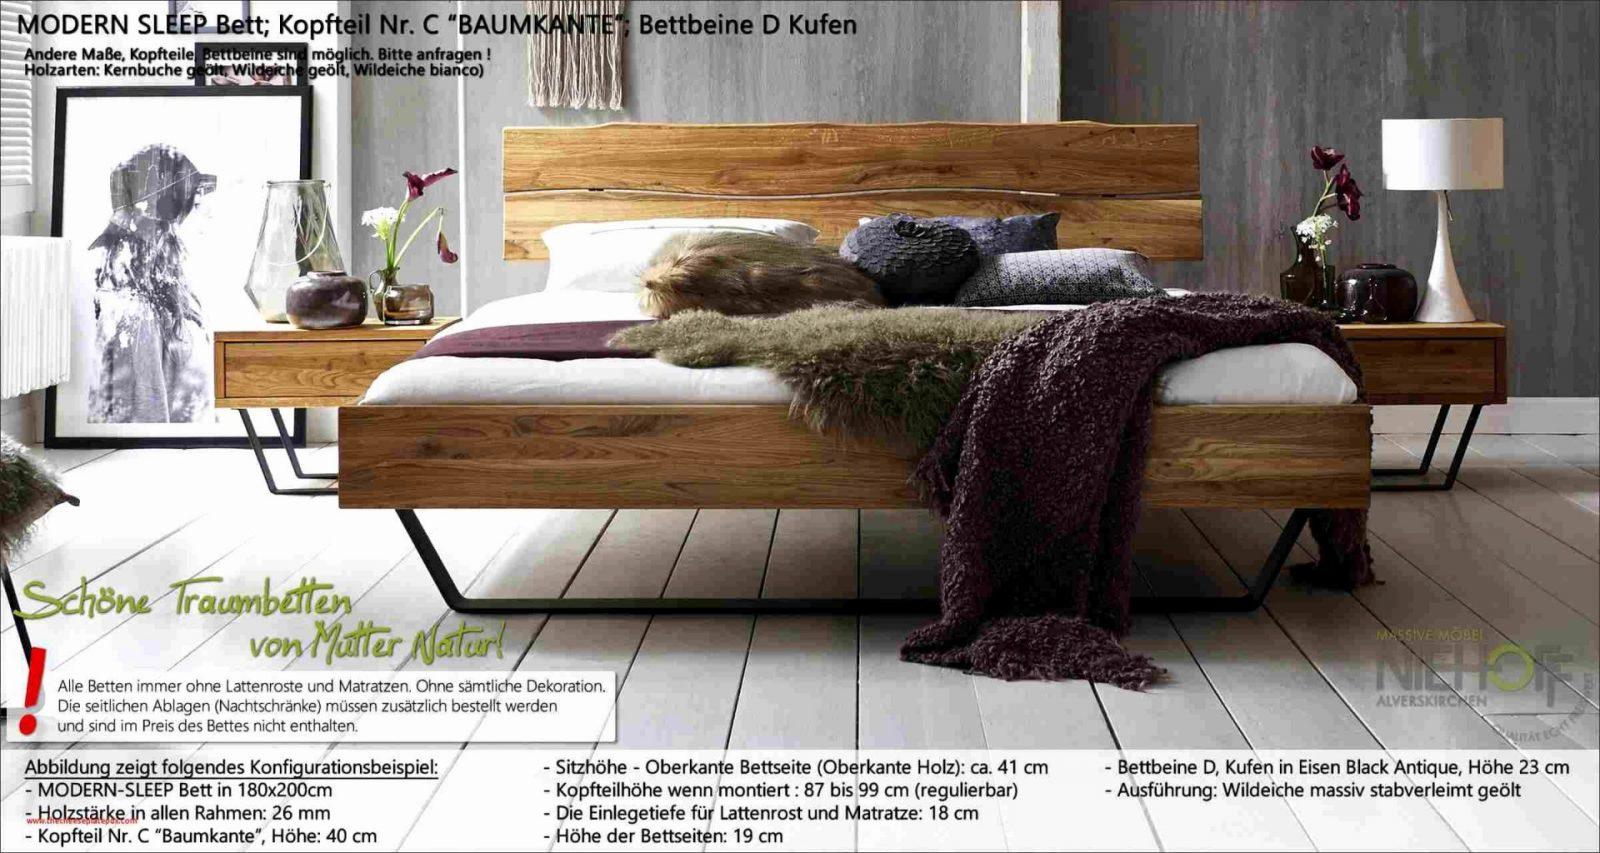 Wasserbett Selber Bauen Fotos Designs Bett Selber Bauen Holz von Bett Selber Bauen Holz Photo